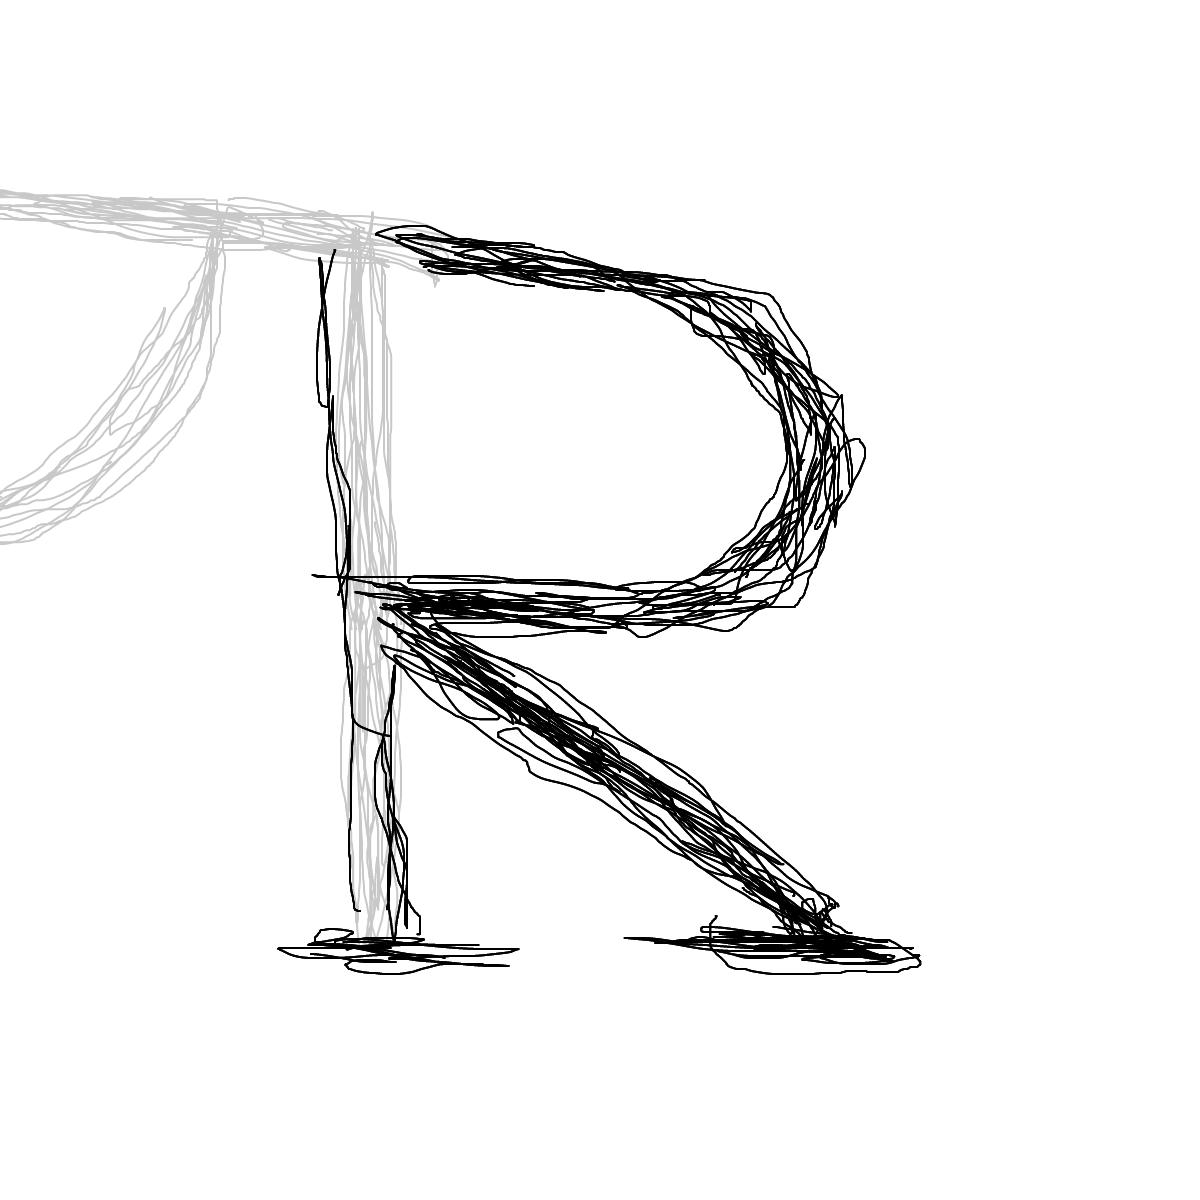 BAAAM drawing#14040 lat:-12.4005918502807620lng: 13.4567079544067380